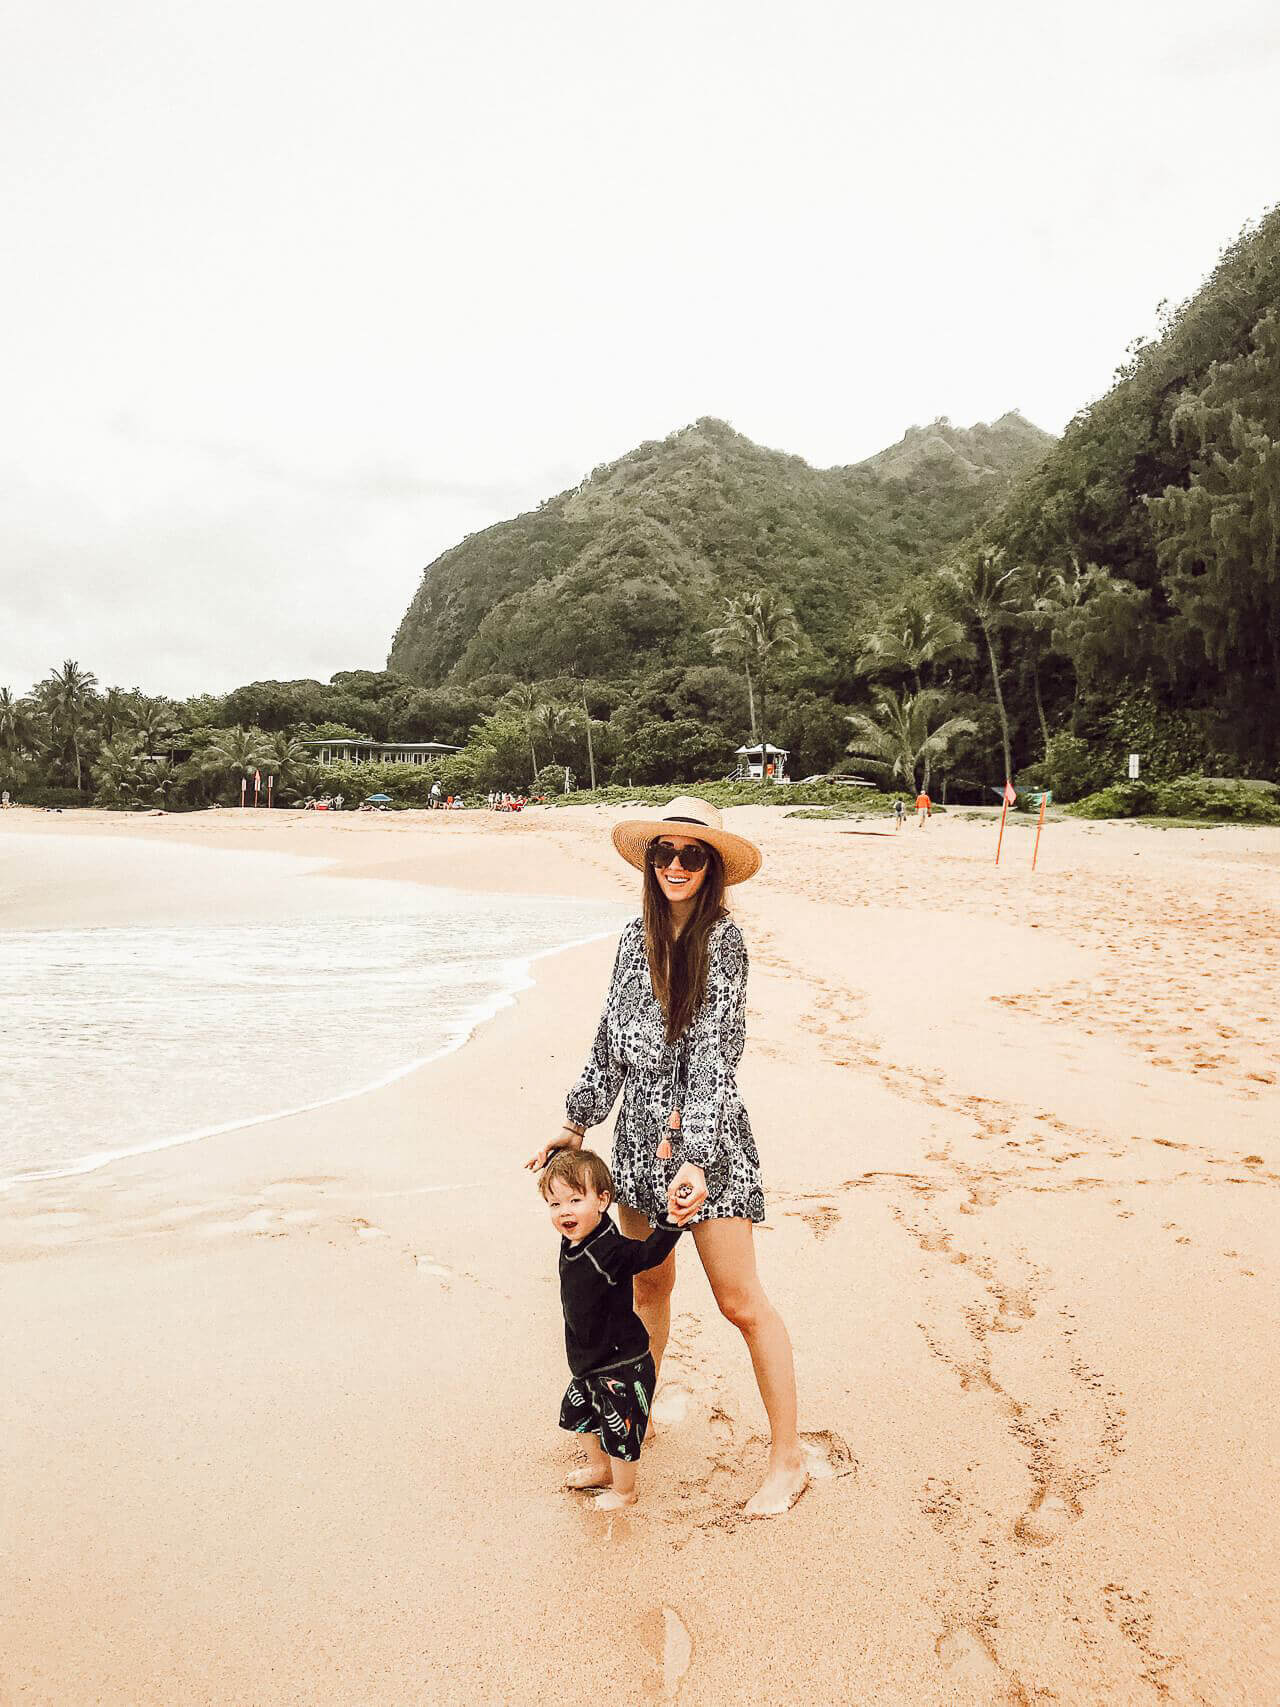 Kauai travel guide for the family! - M Loves M @marmar